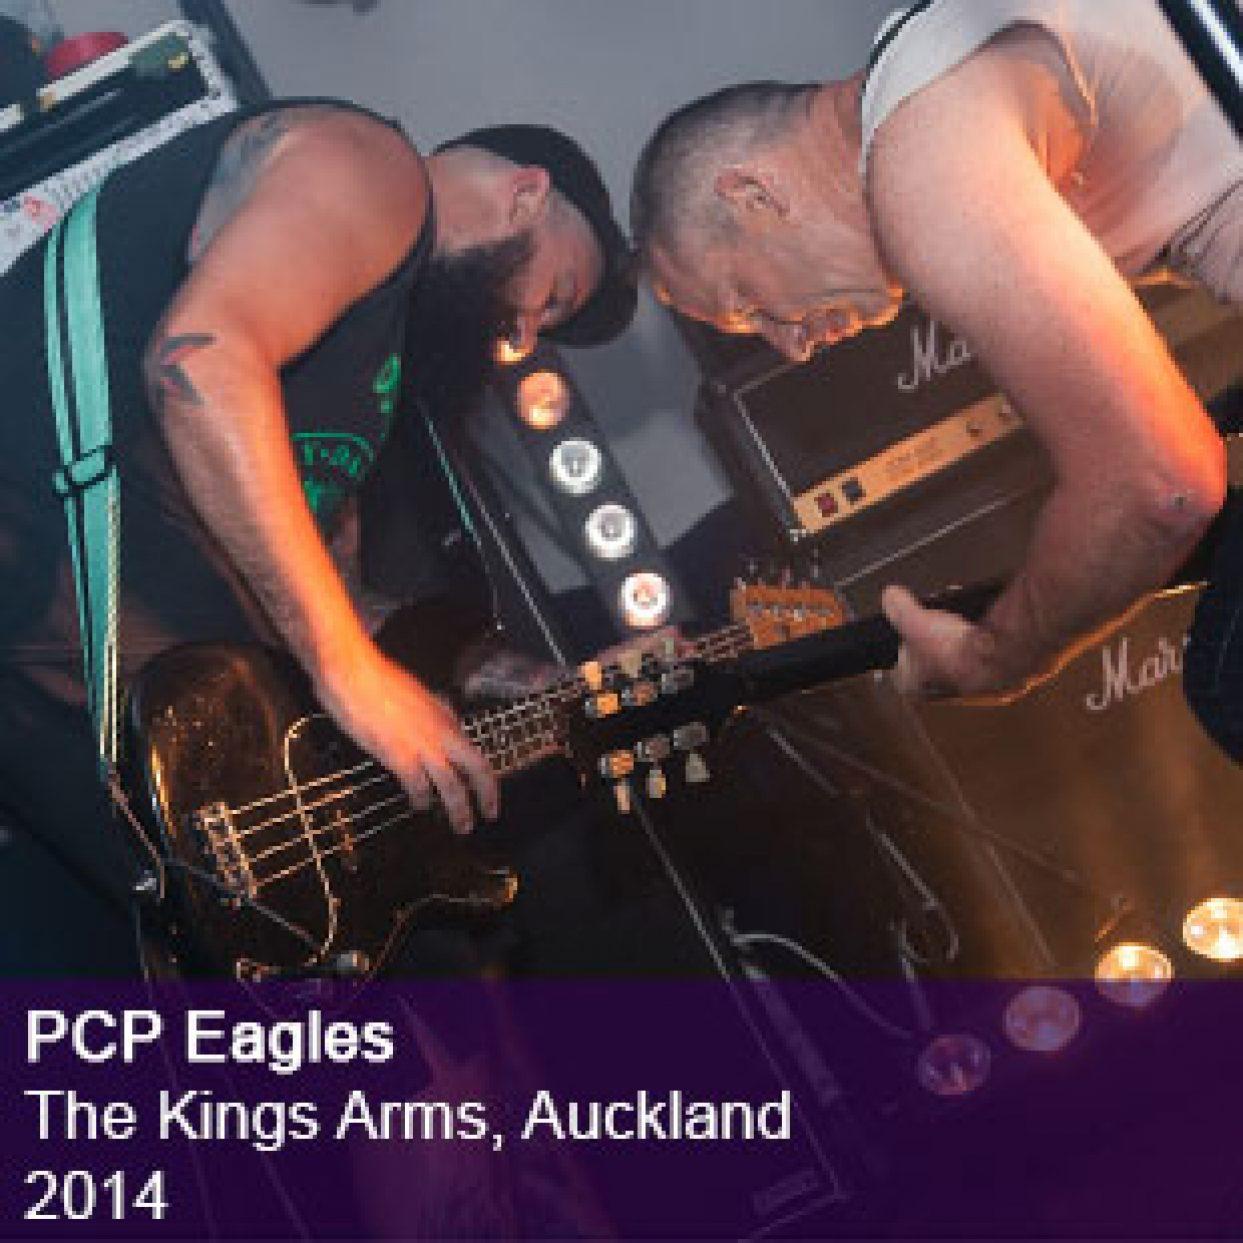 PCP Eagles live